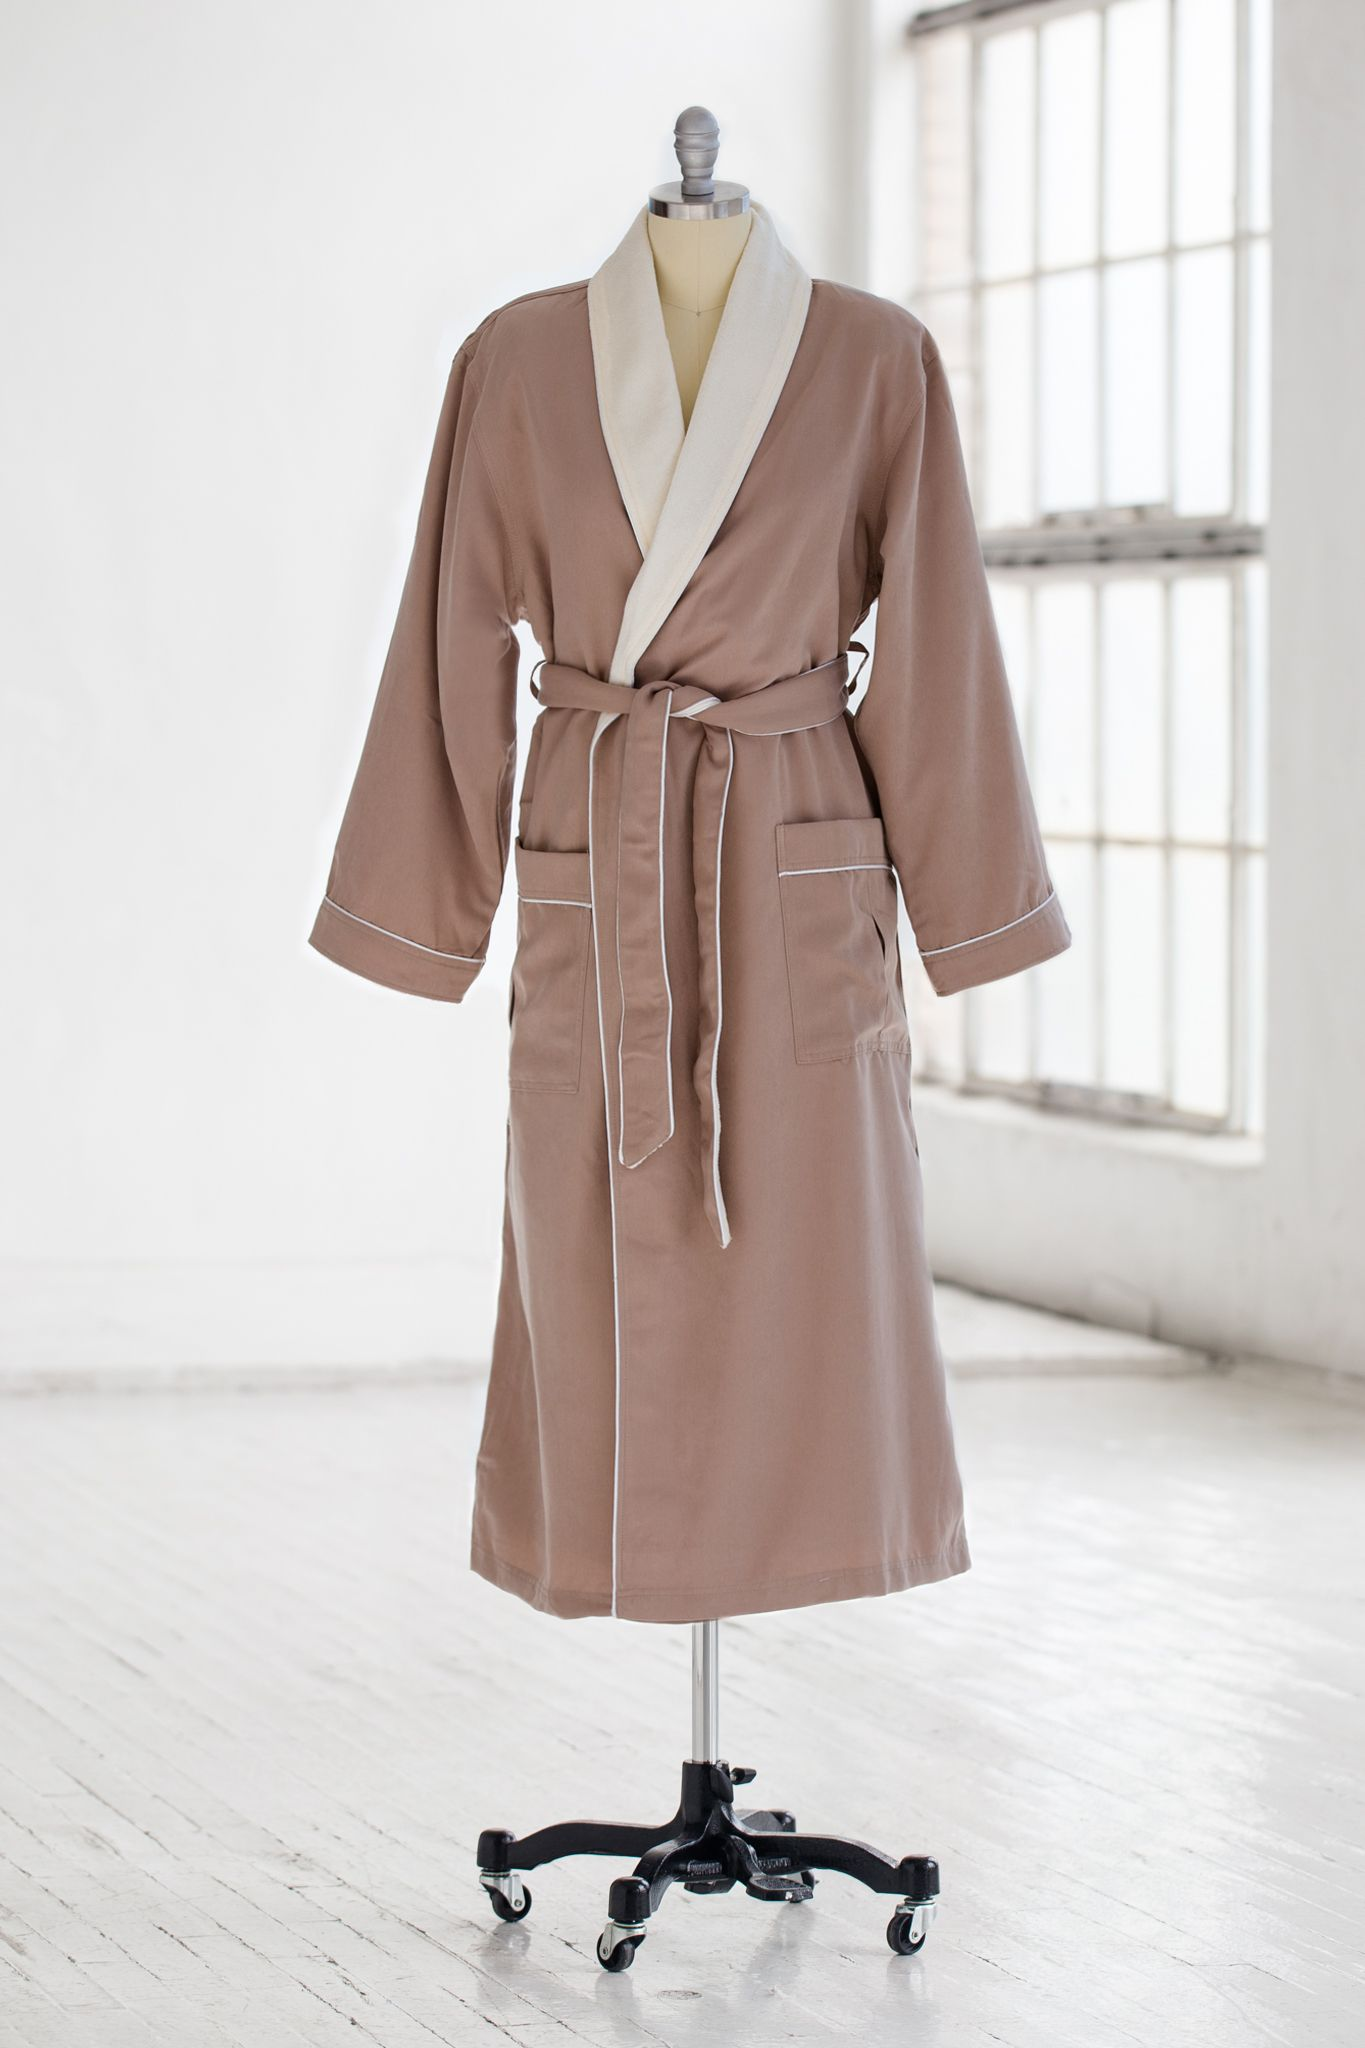 Classic Spa Robe - Terry Cloth   Microfiber - Sedona Creme  2a47e9614